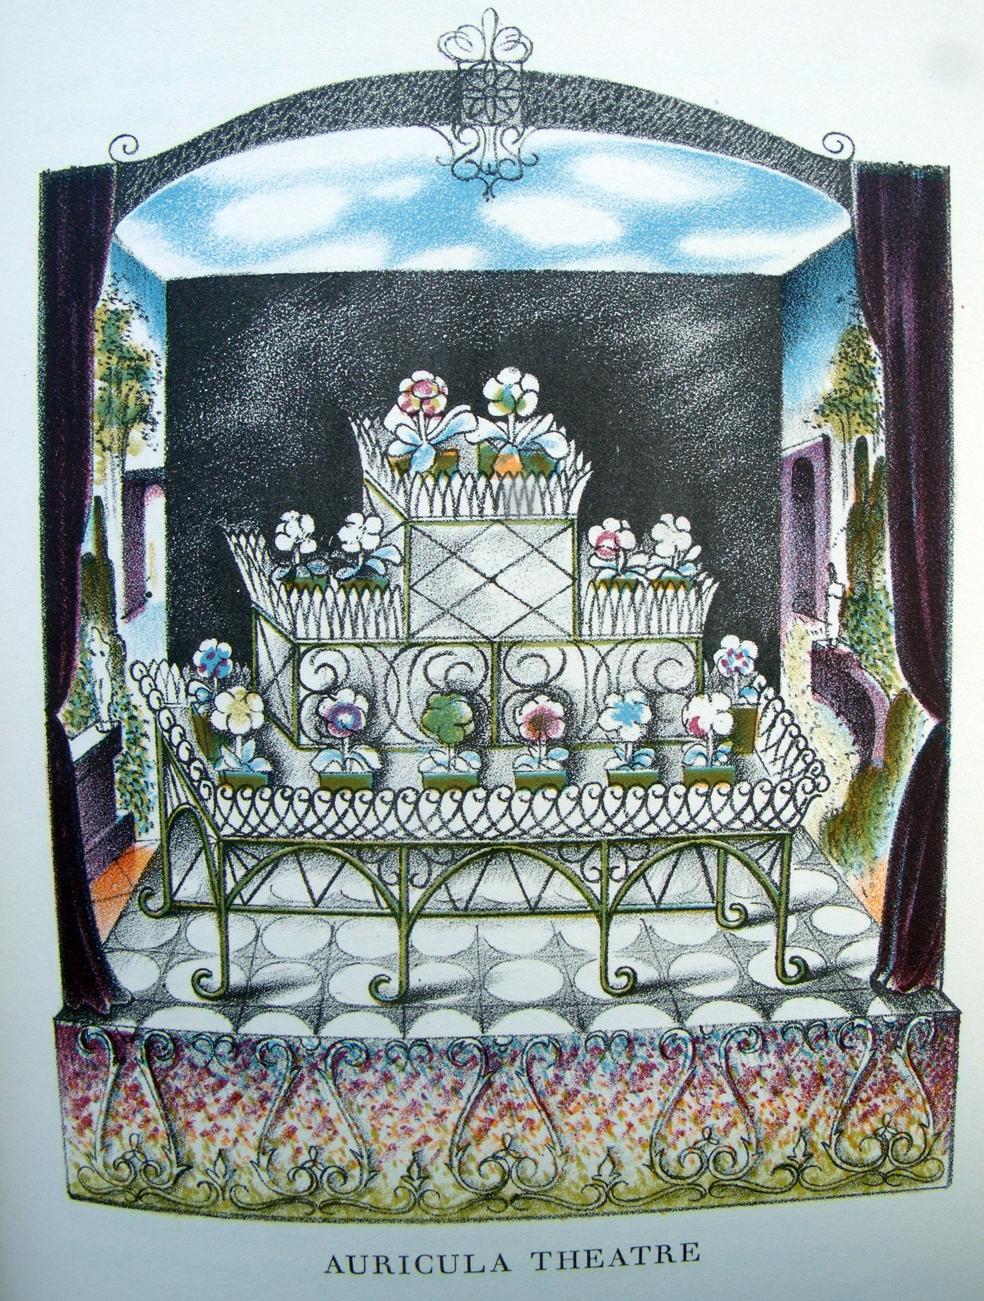 Auricula Theatre illustration by John Farleigh